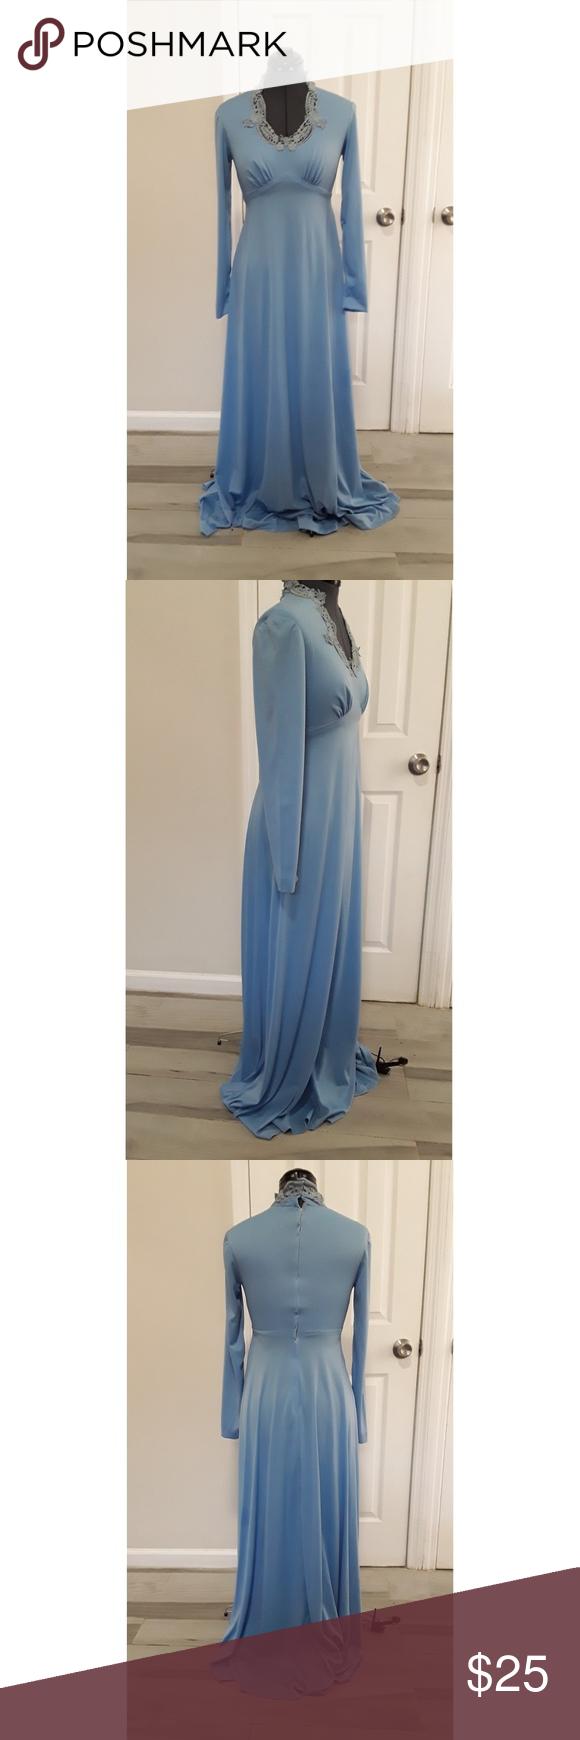 Vintage 70s Dress Formal Gown Empire Waist Vintage Dress 70s 70s Dress Formal Dresses [ 1740 x 580 Pixel ]